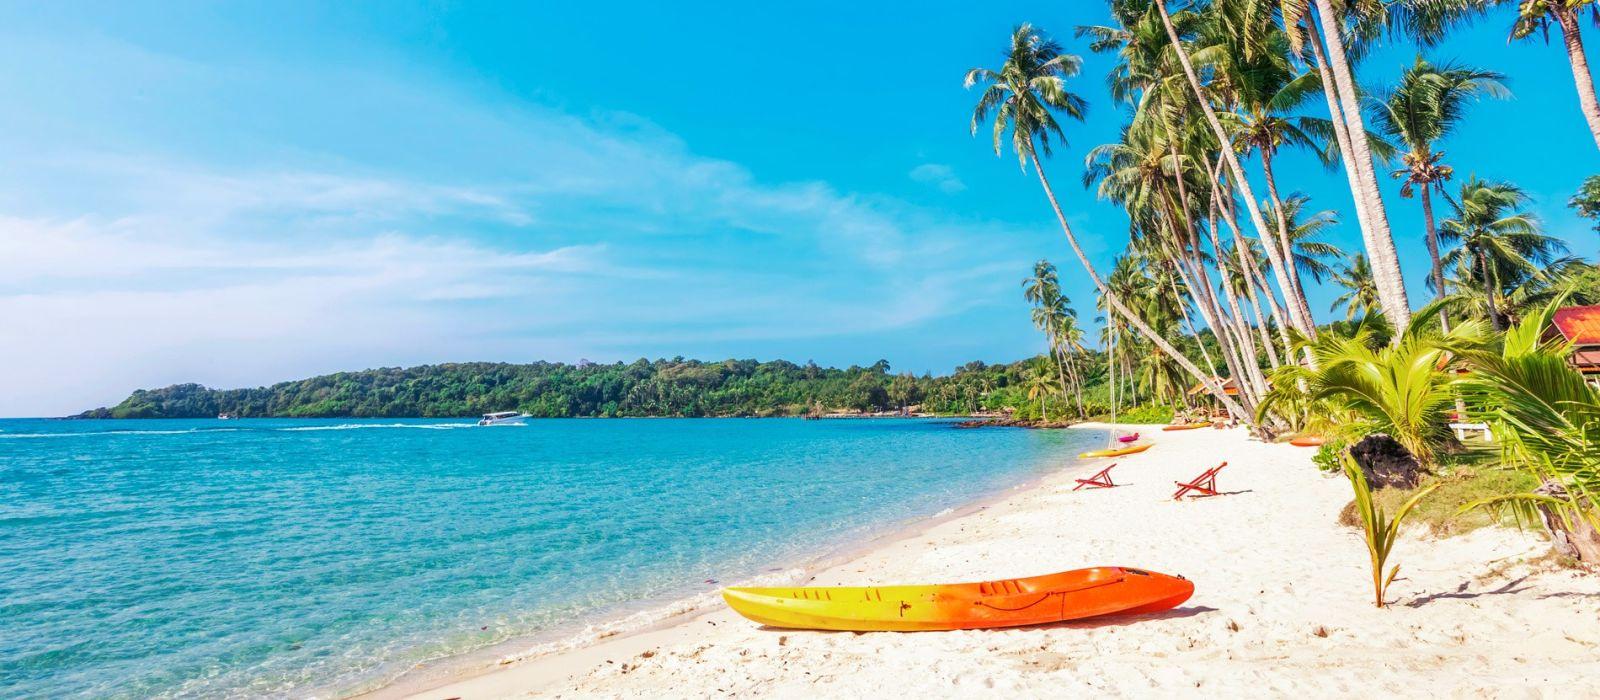 Reiseziel Phu Quoc Island Vietnam